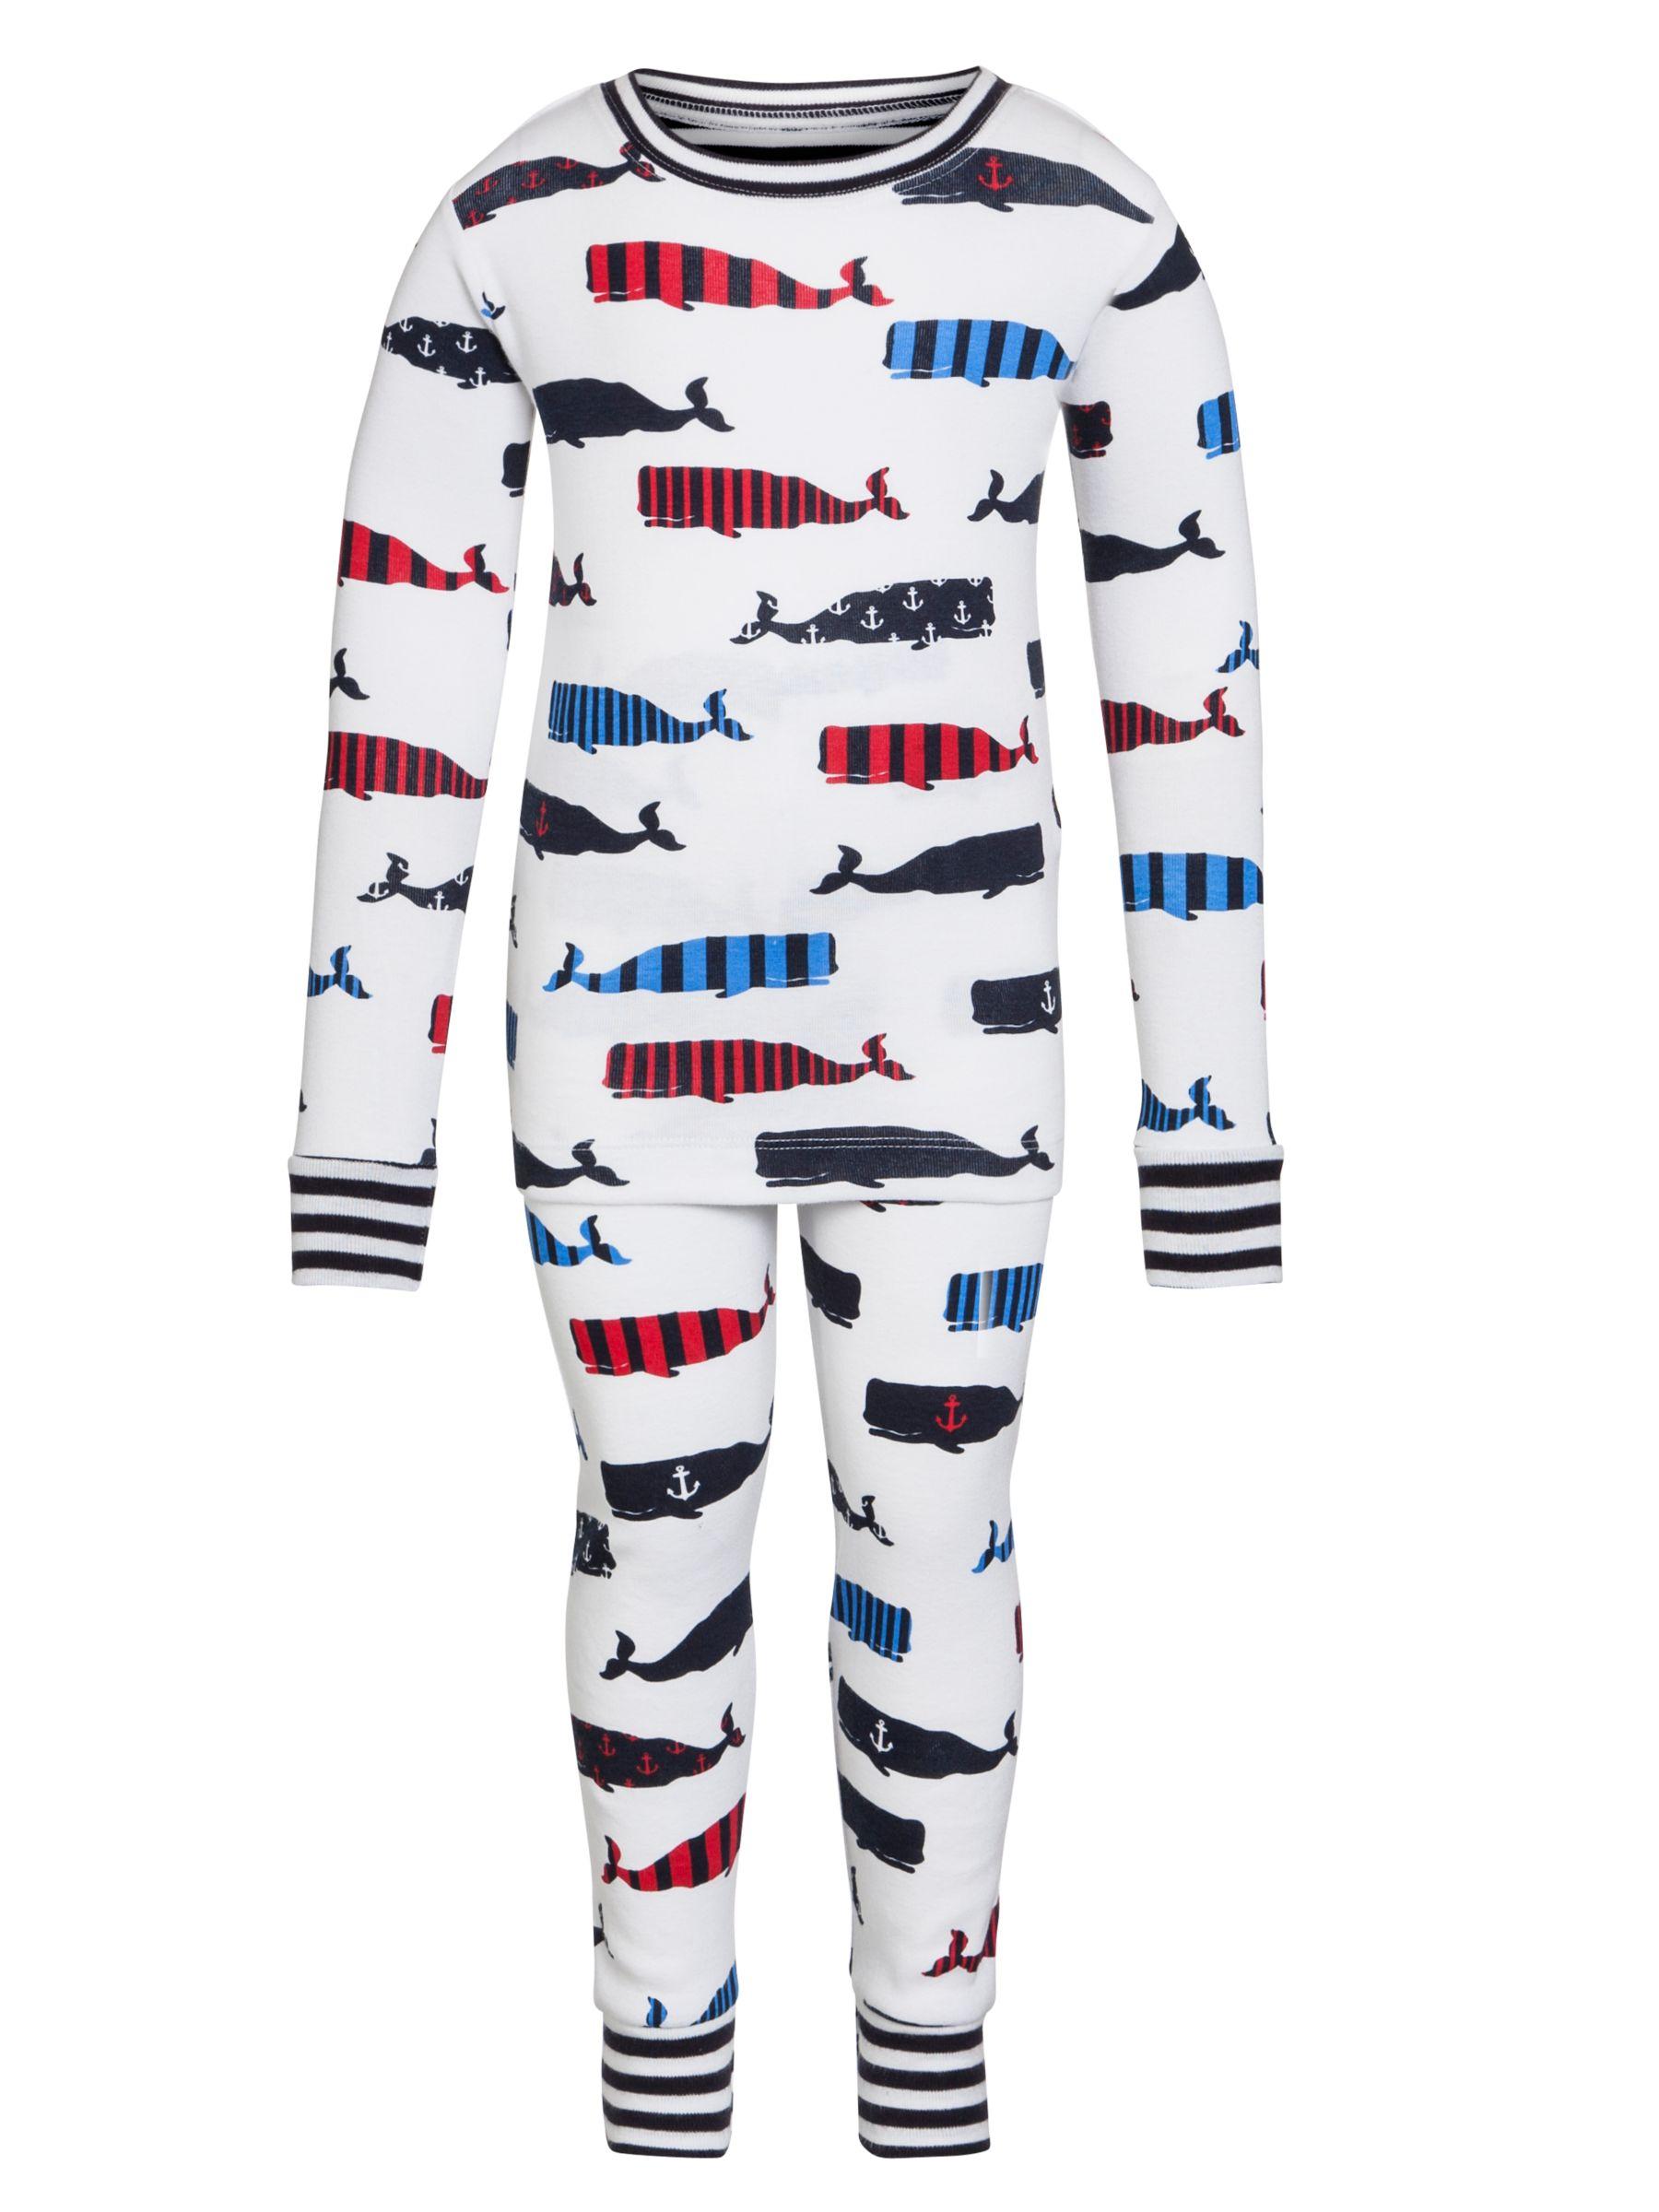 Hatley Boys' Long Sleeve Whale Pyjamas, White/Multi